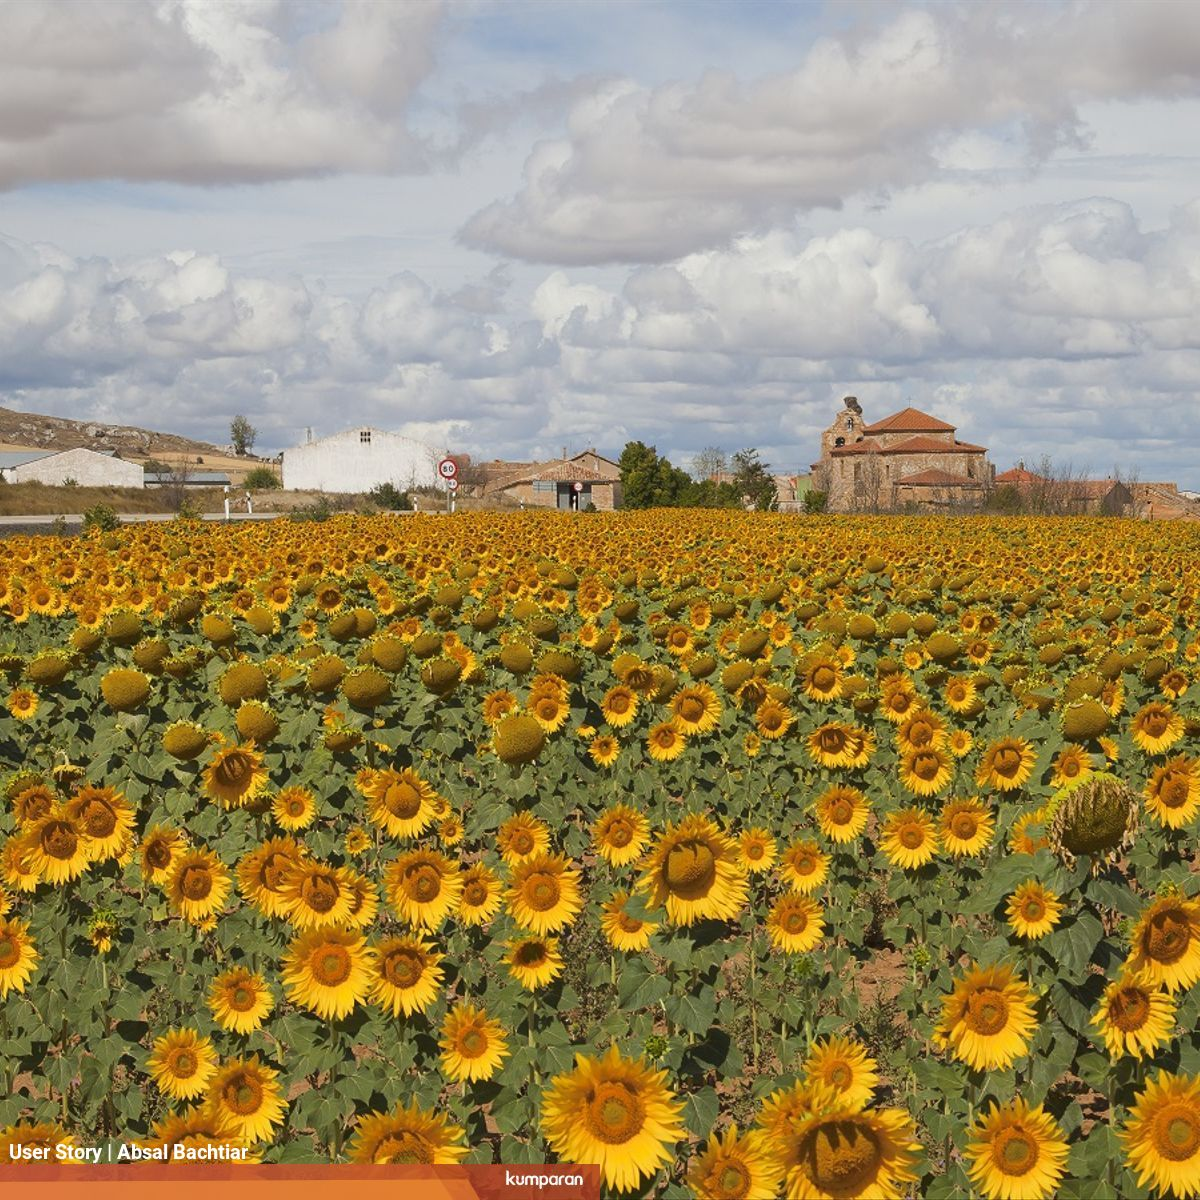 Apakah Bunga Matahari Mengikuti Arah Matahari Selama 24 Jam